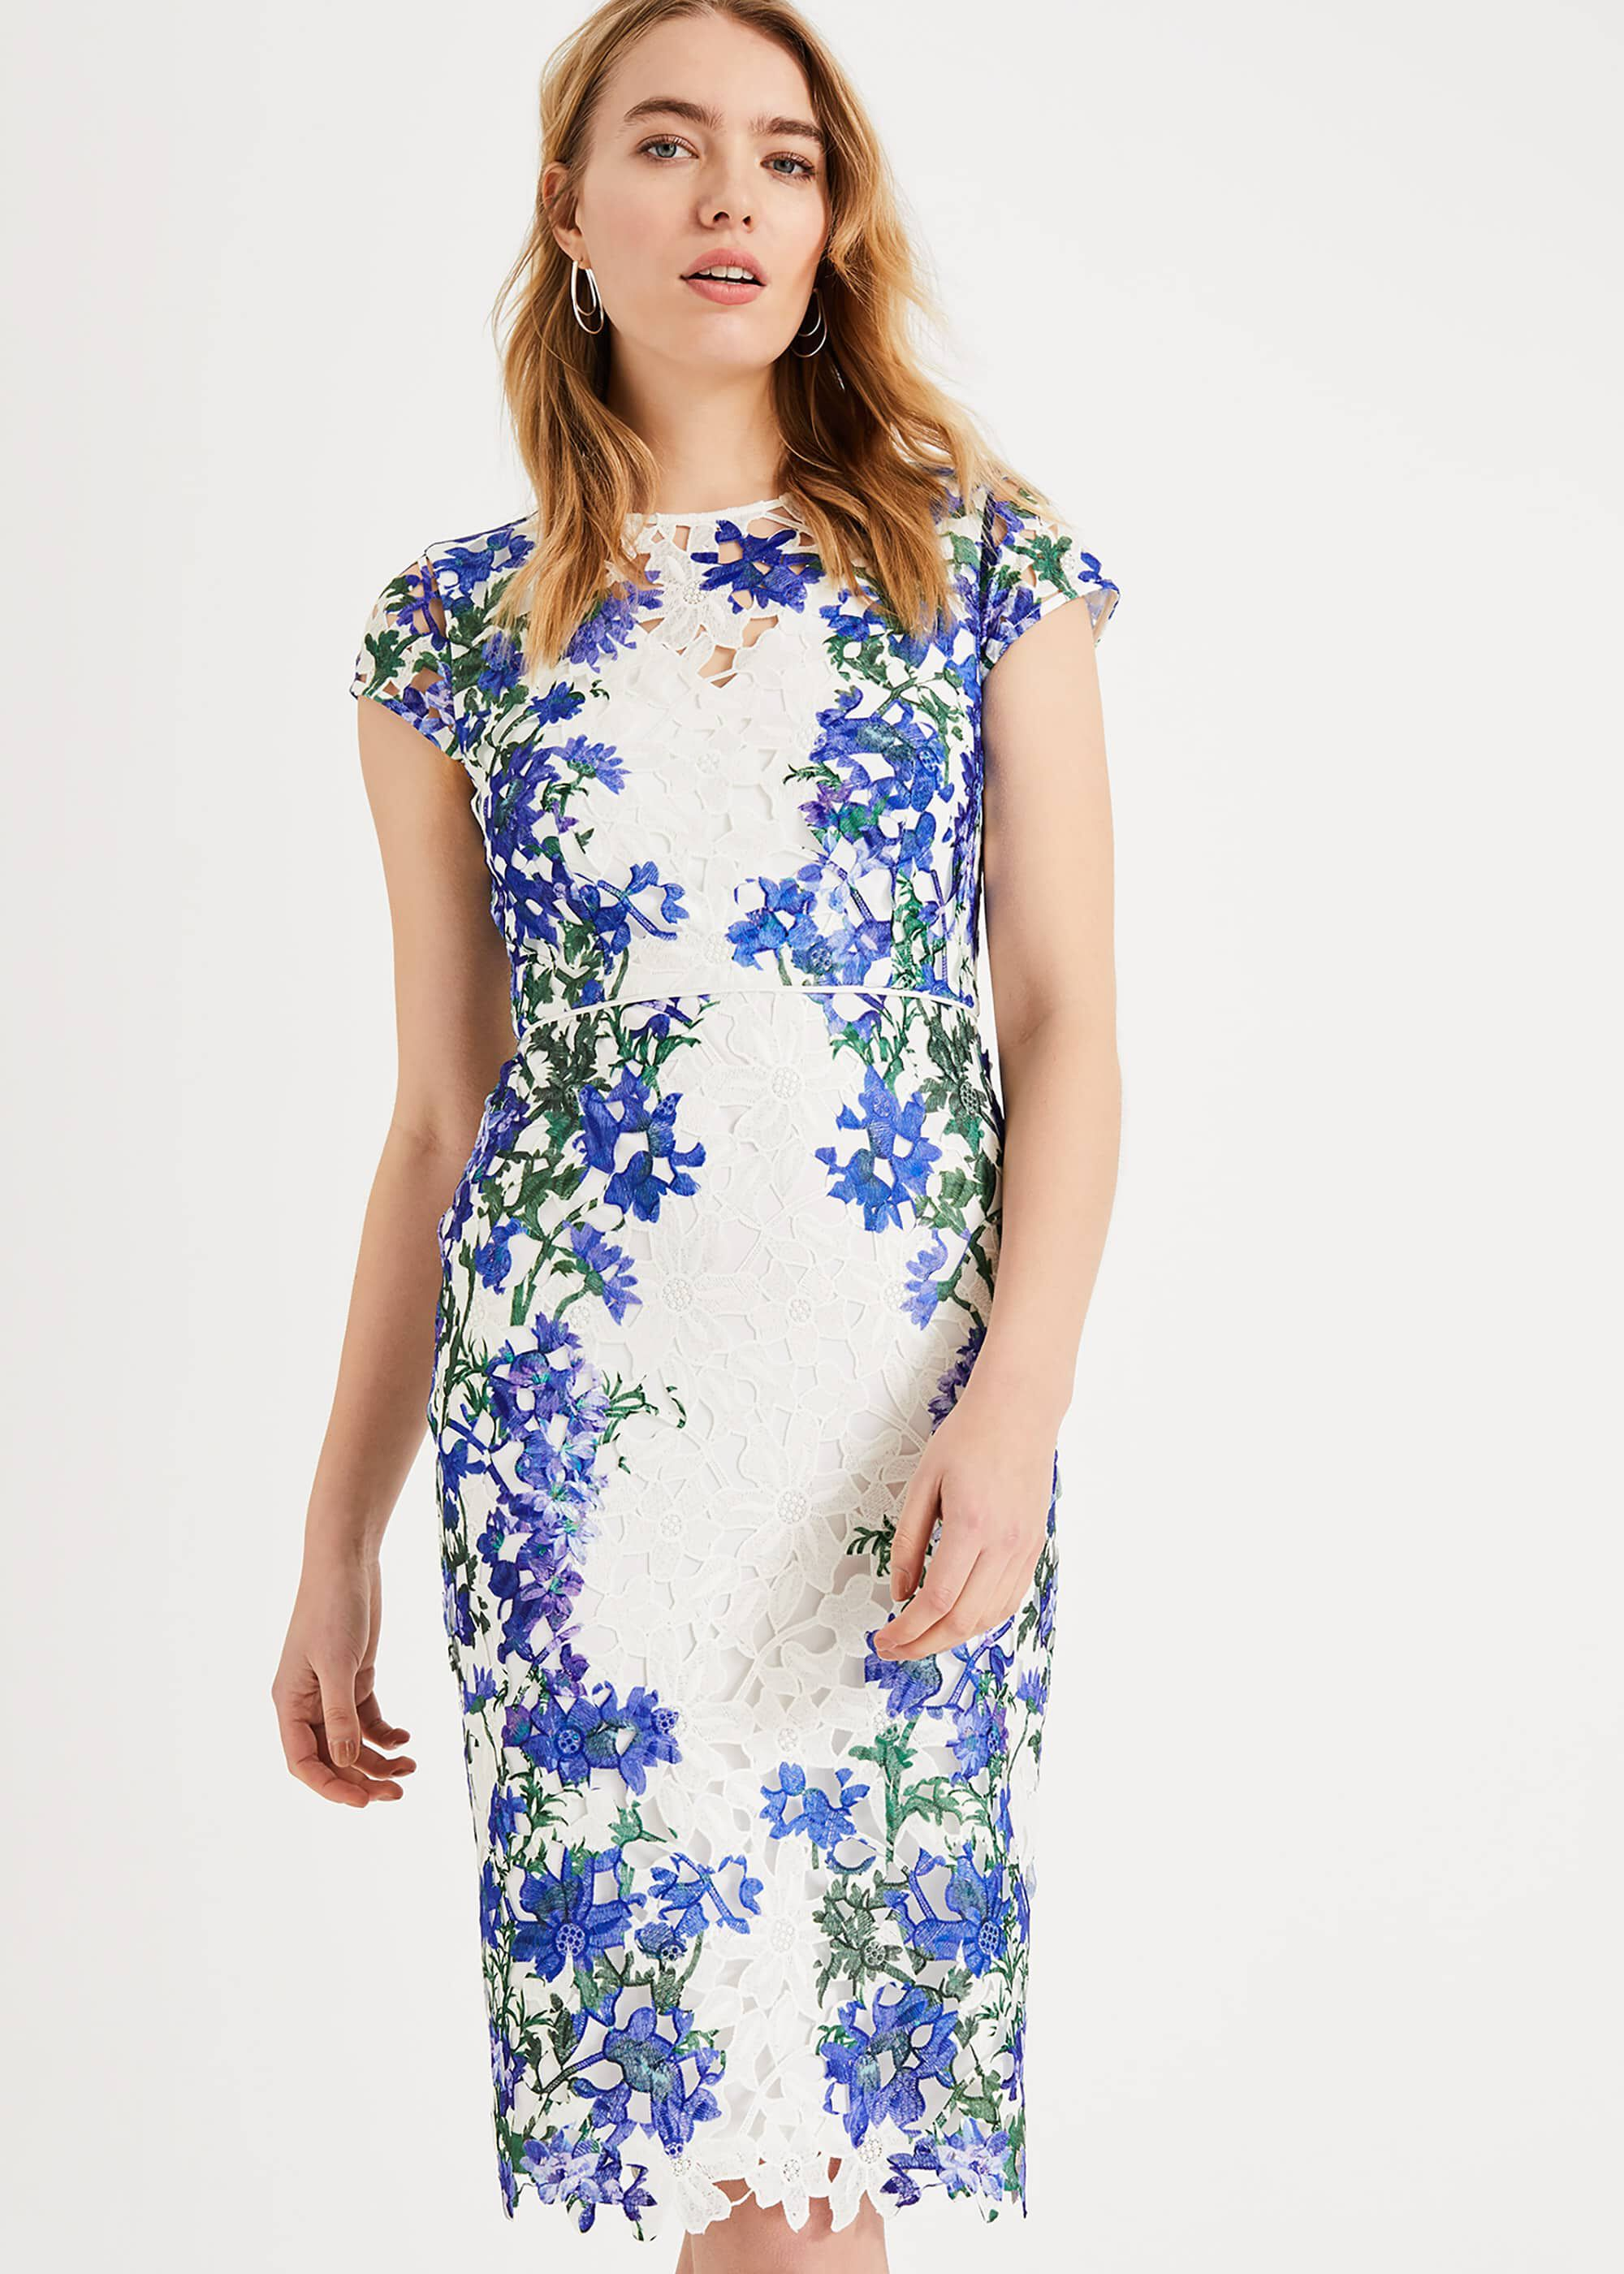 Floral Lace DressPhase Kyra Eight Kyra CsQdxrht